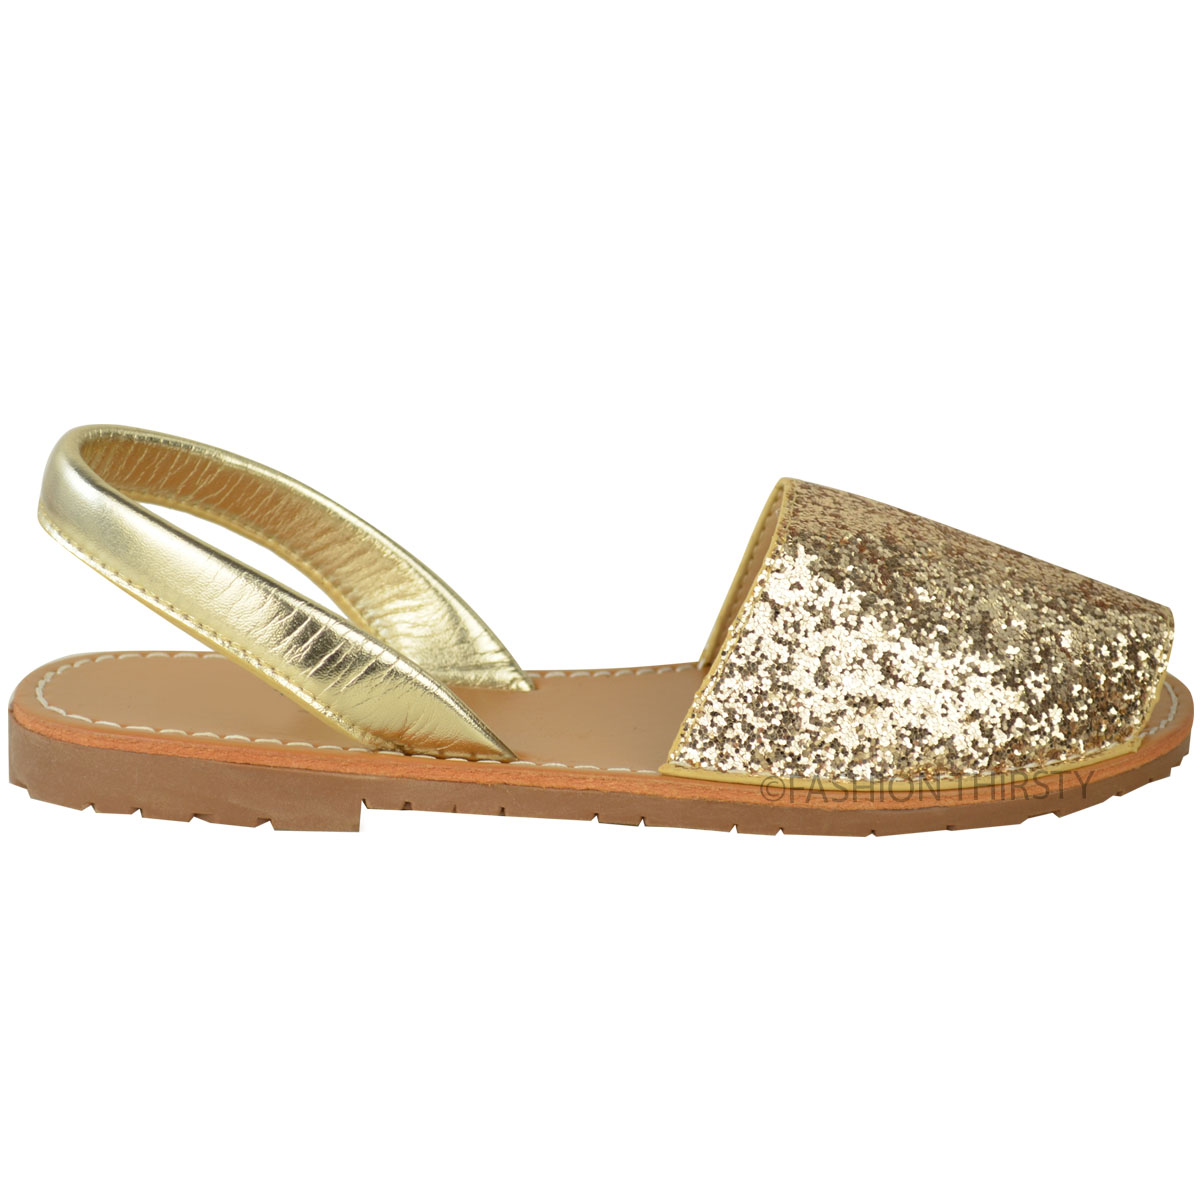 womens ladies summer menorcan sandals glitter sling back. Black Bedroom Furniture Sets. Home Design Ideas